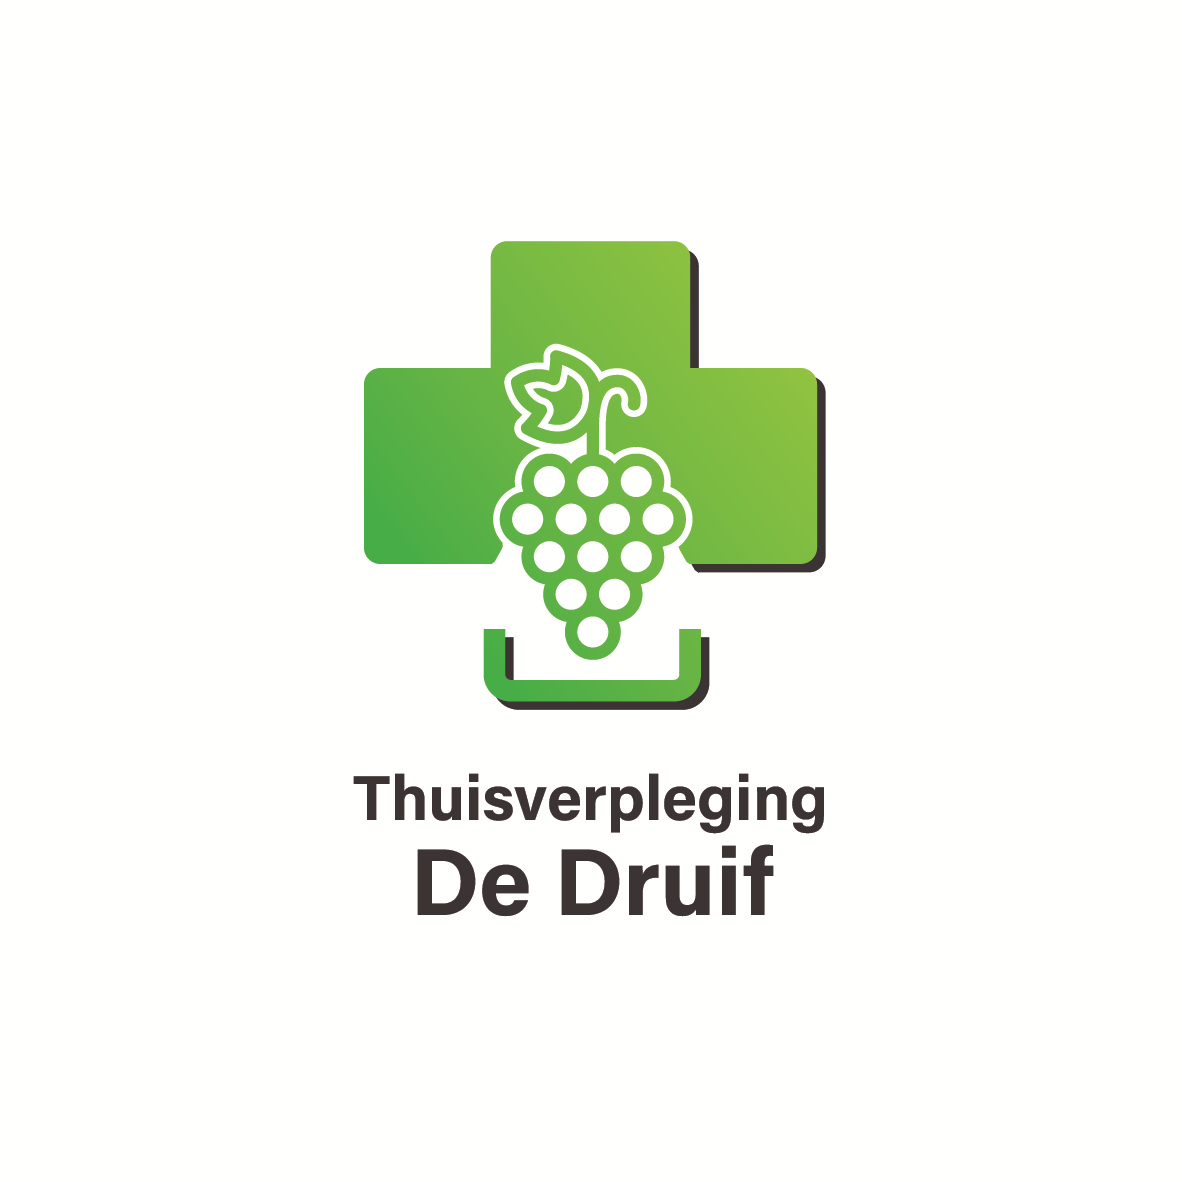 Thuisverpleging De Druif